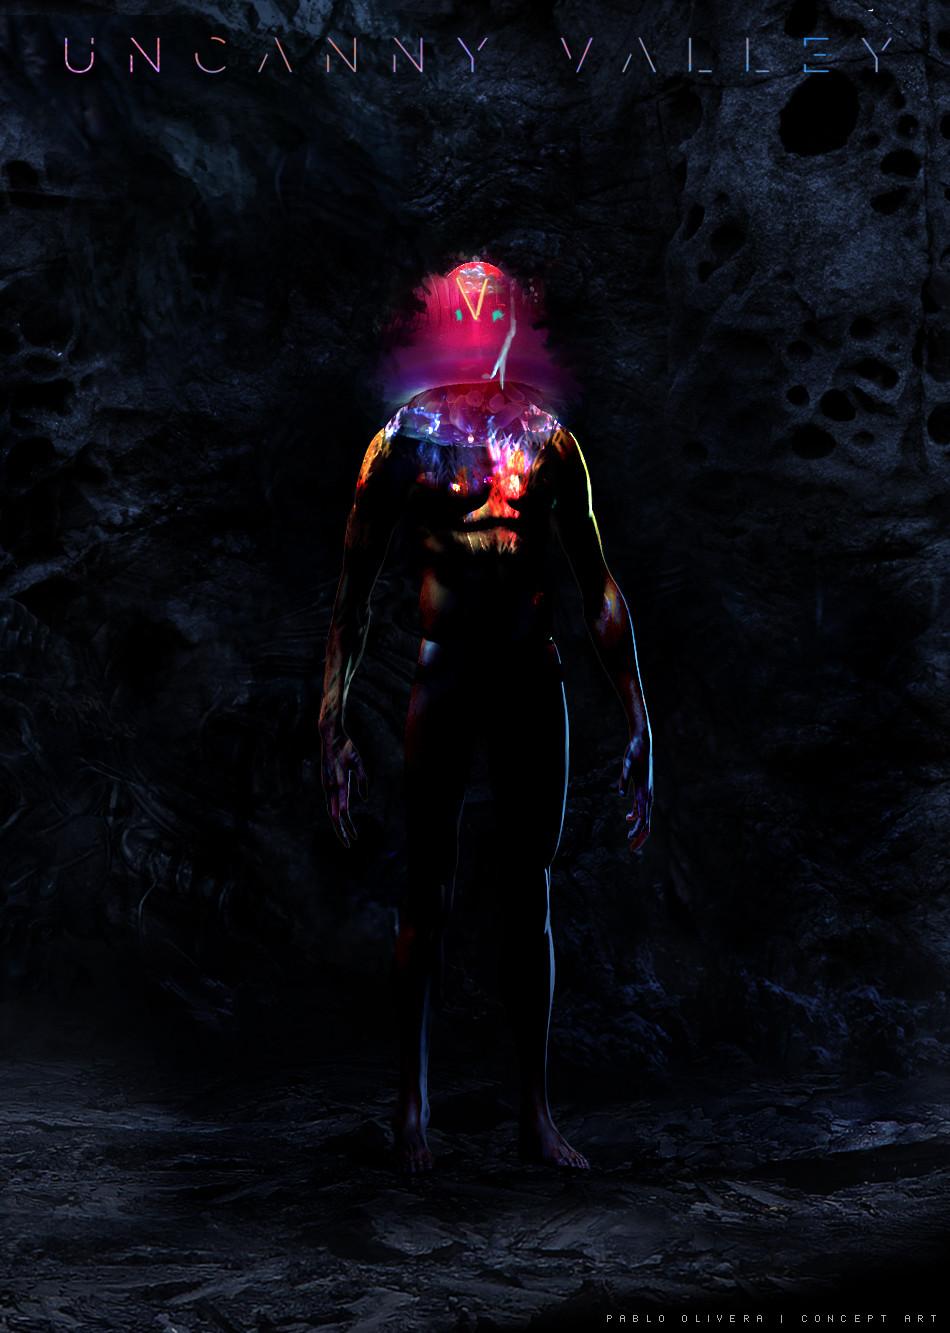 Pablo olivera uncanny valley character design alien 10